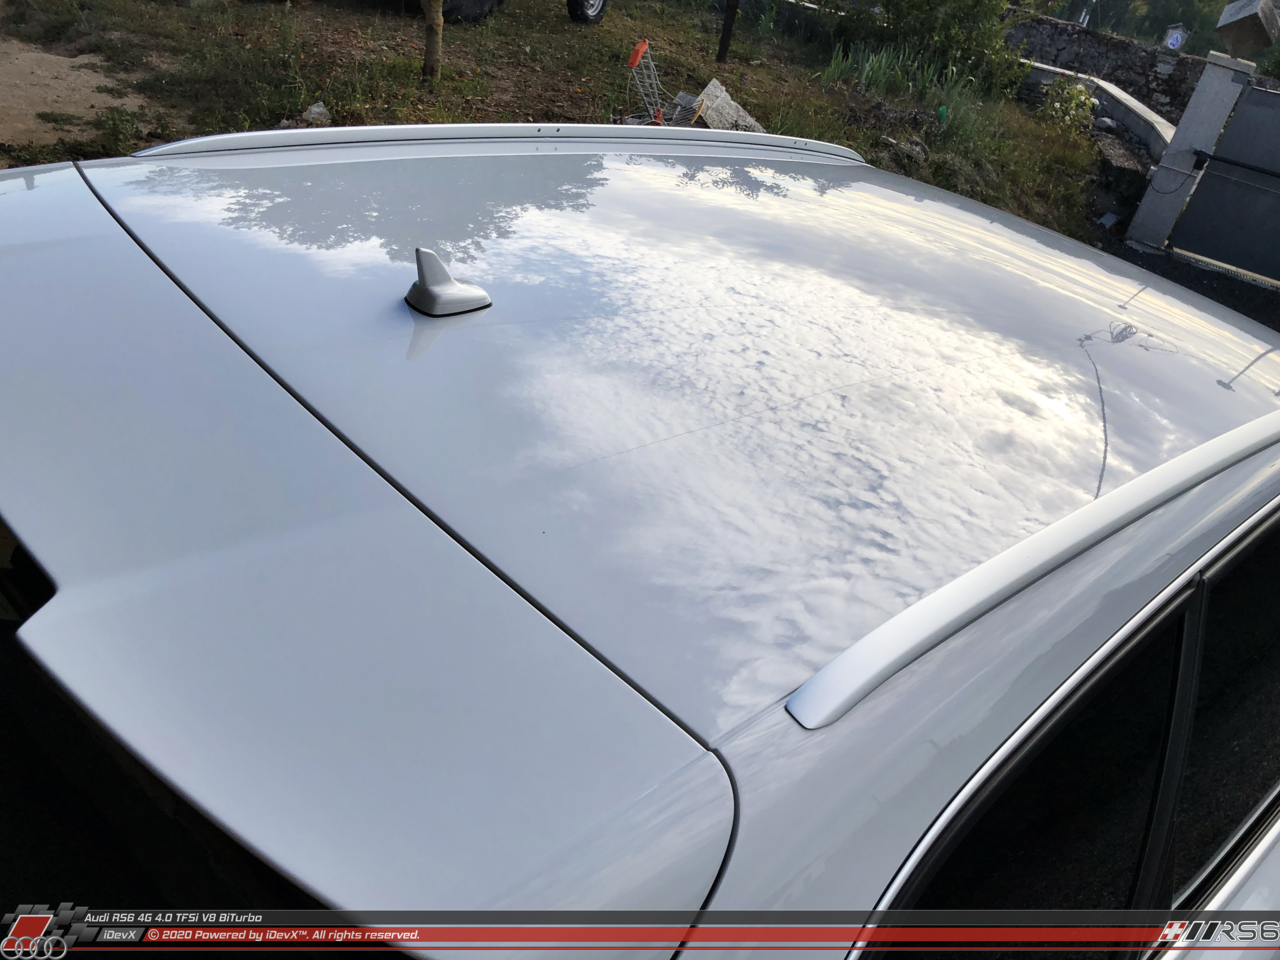 05_08.2019_Audi-RS6_iDevX_053.png